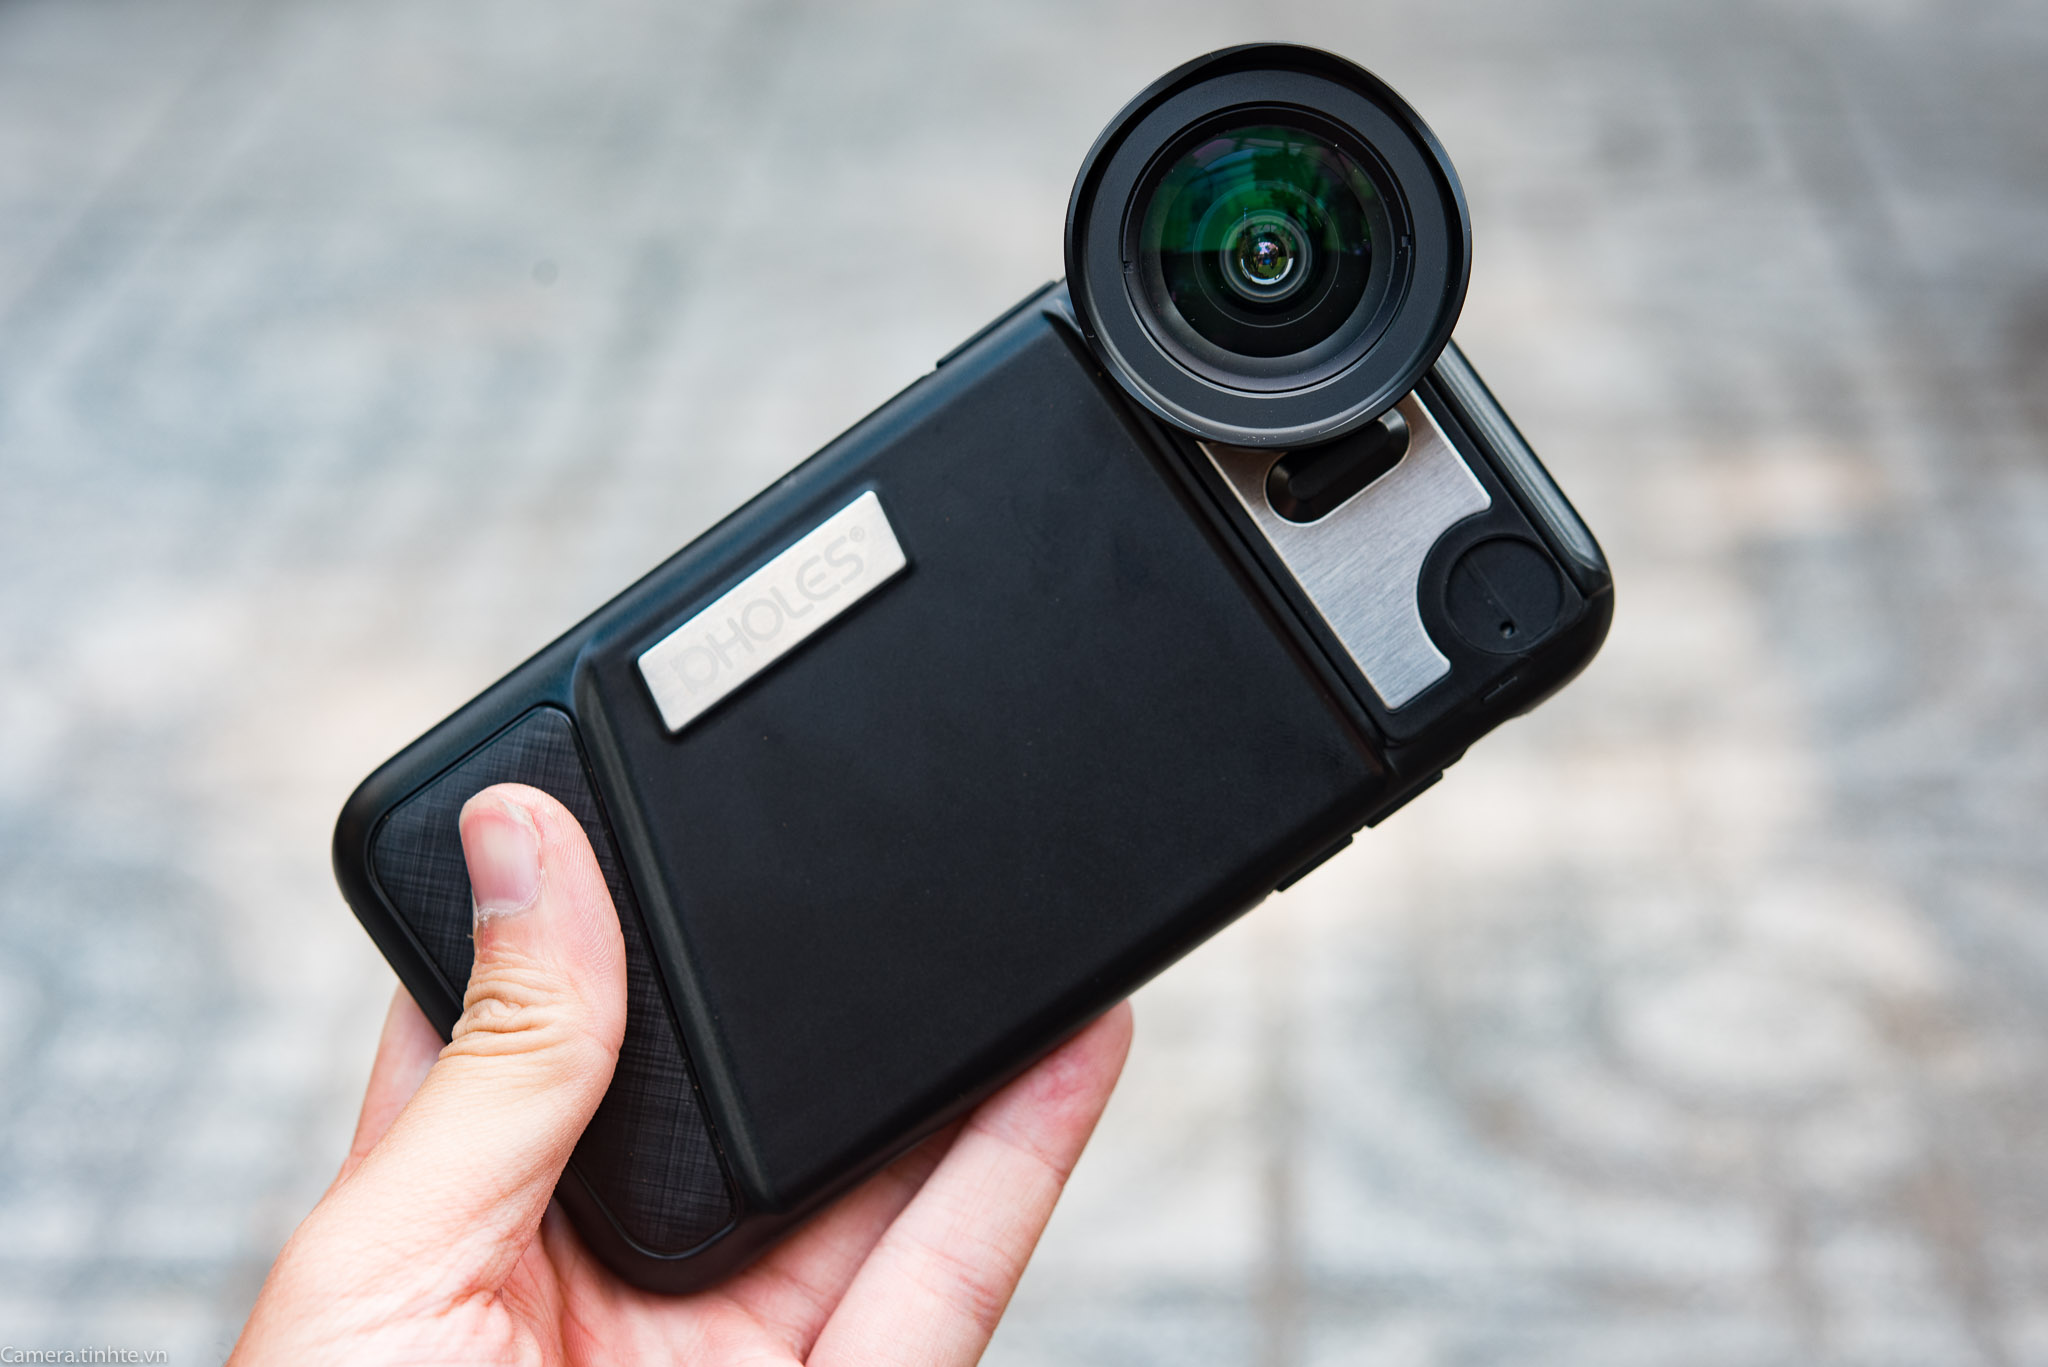 Tren tay ong kinh P-Hole lens iPhone X - Camera.tinhte.vn-11.jpg